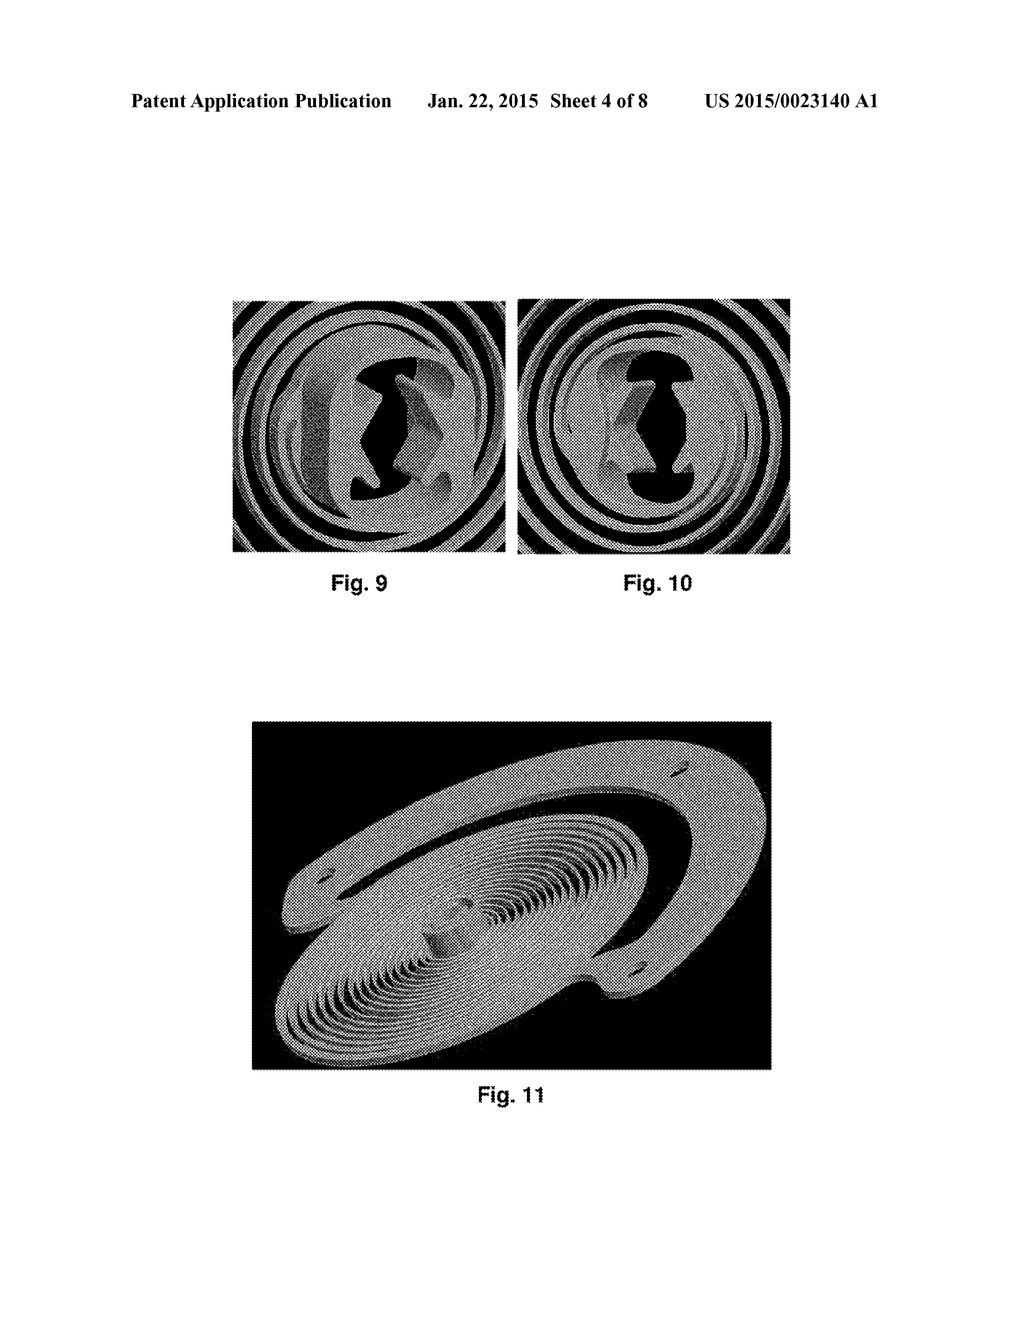 rolex-patent-7.jpg